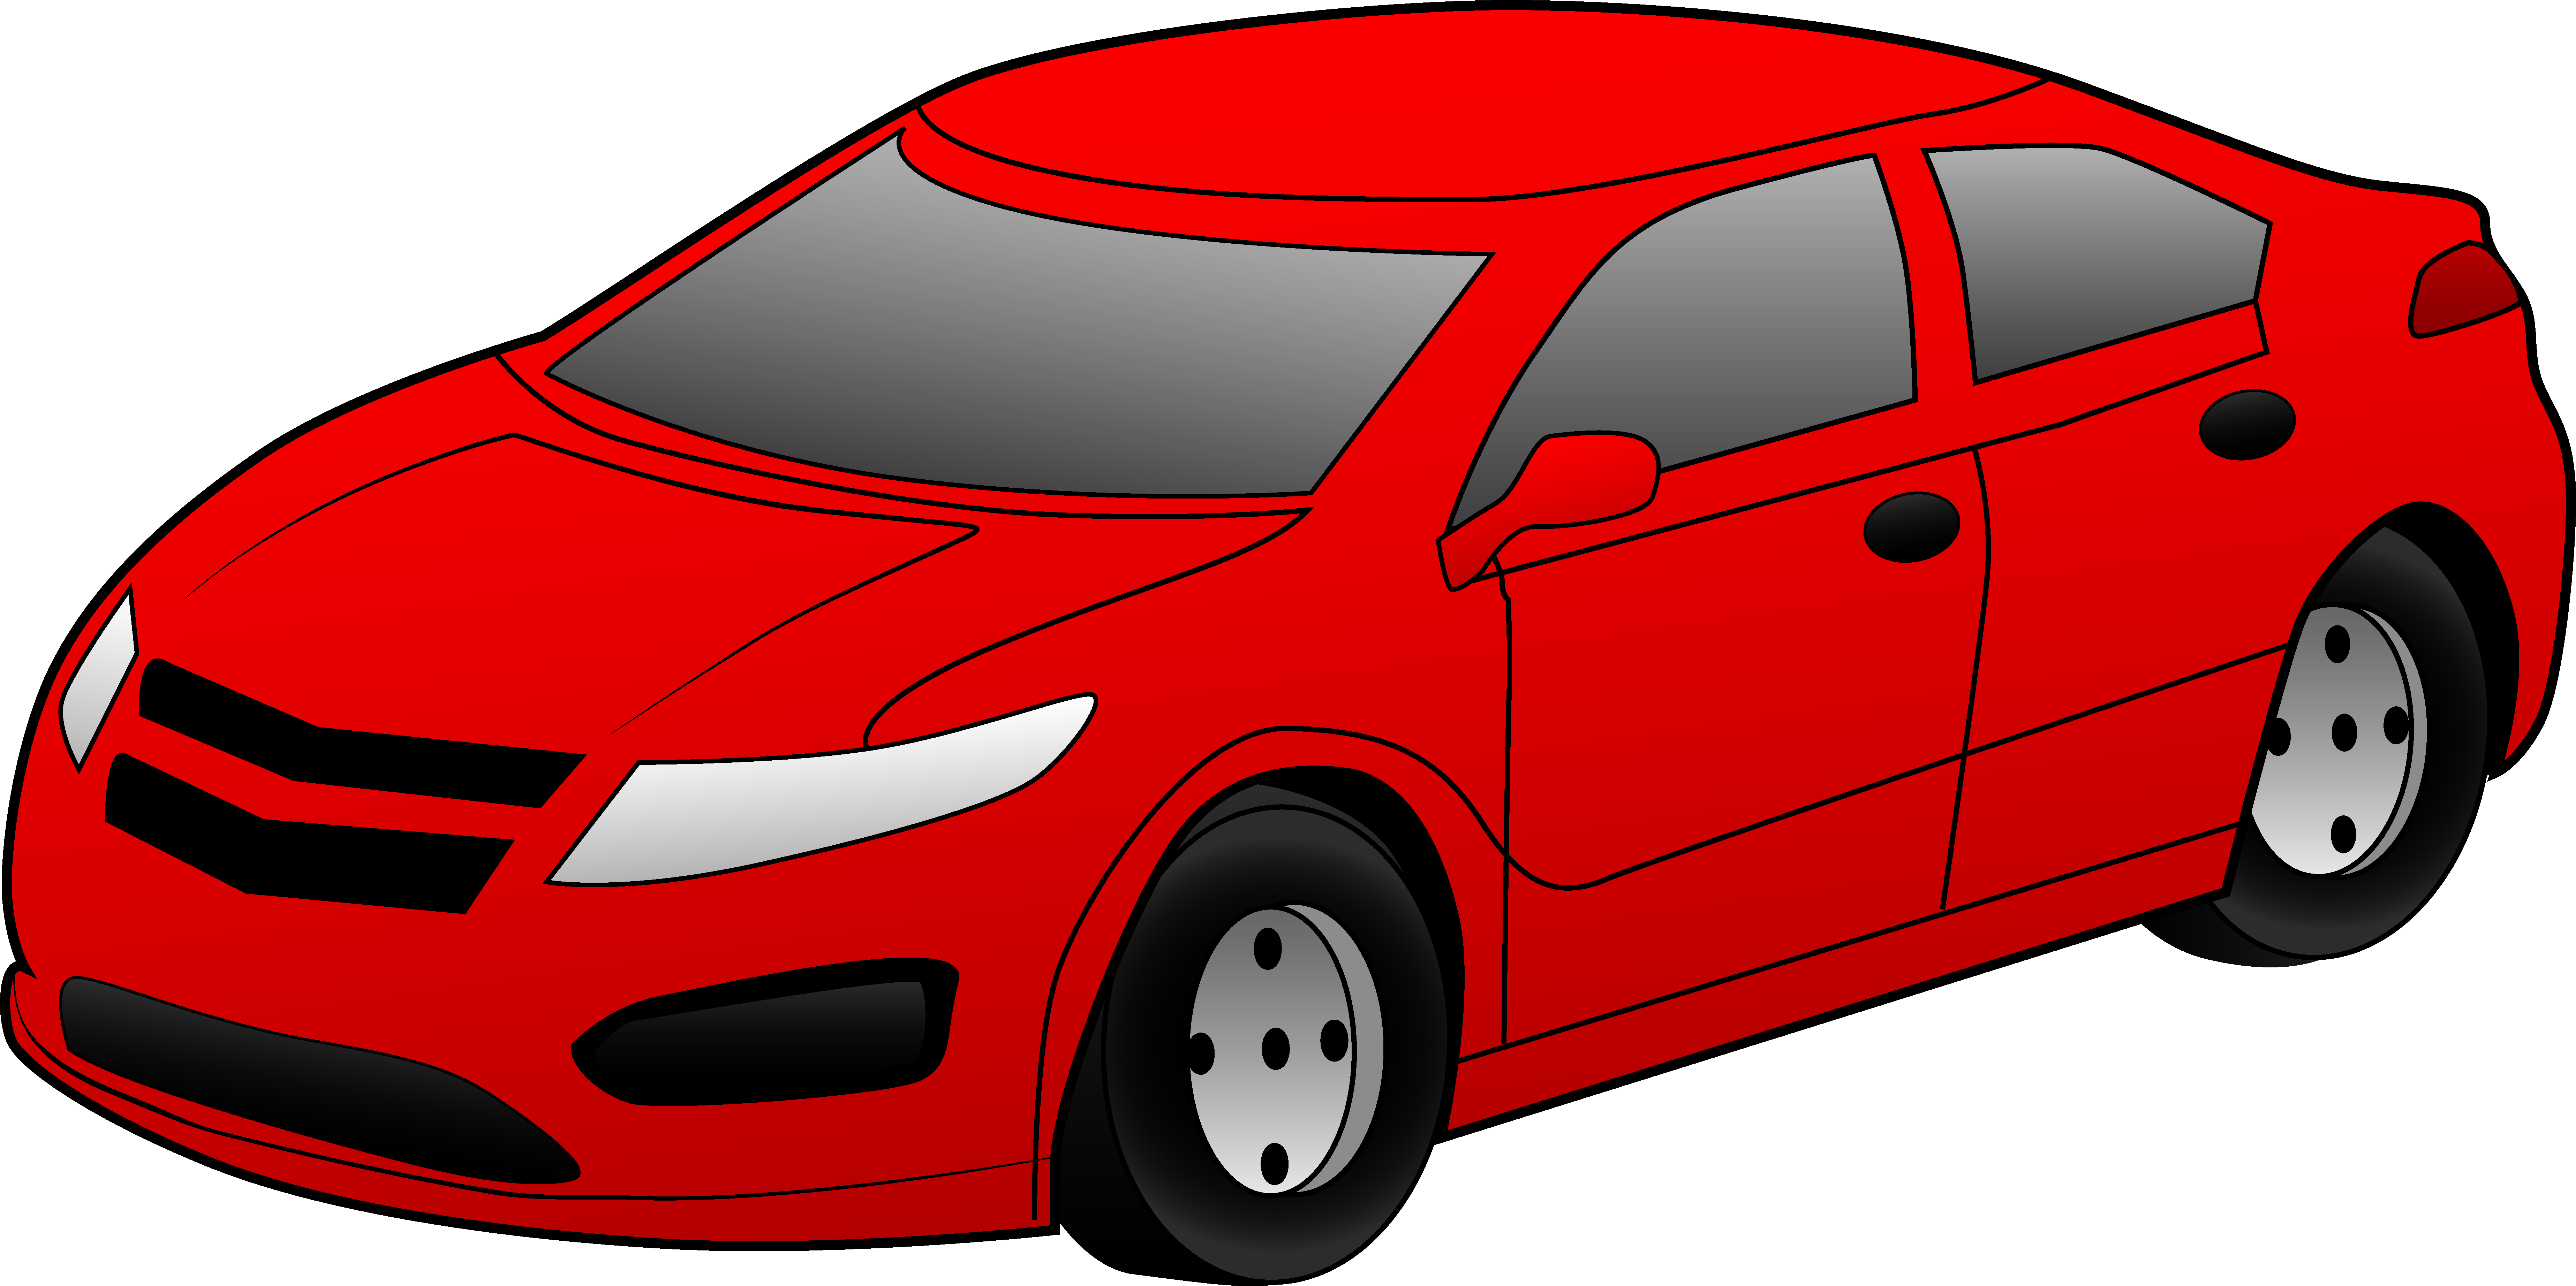 7387x3689 Black Sports Car Clipart Clipart Panda